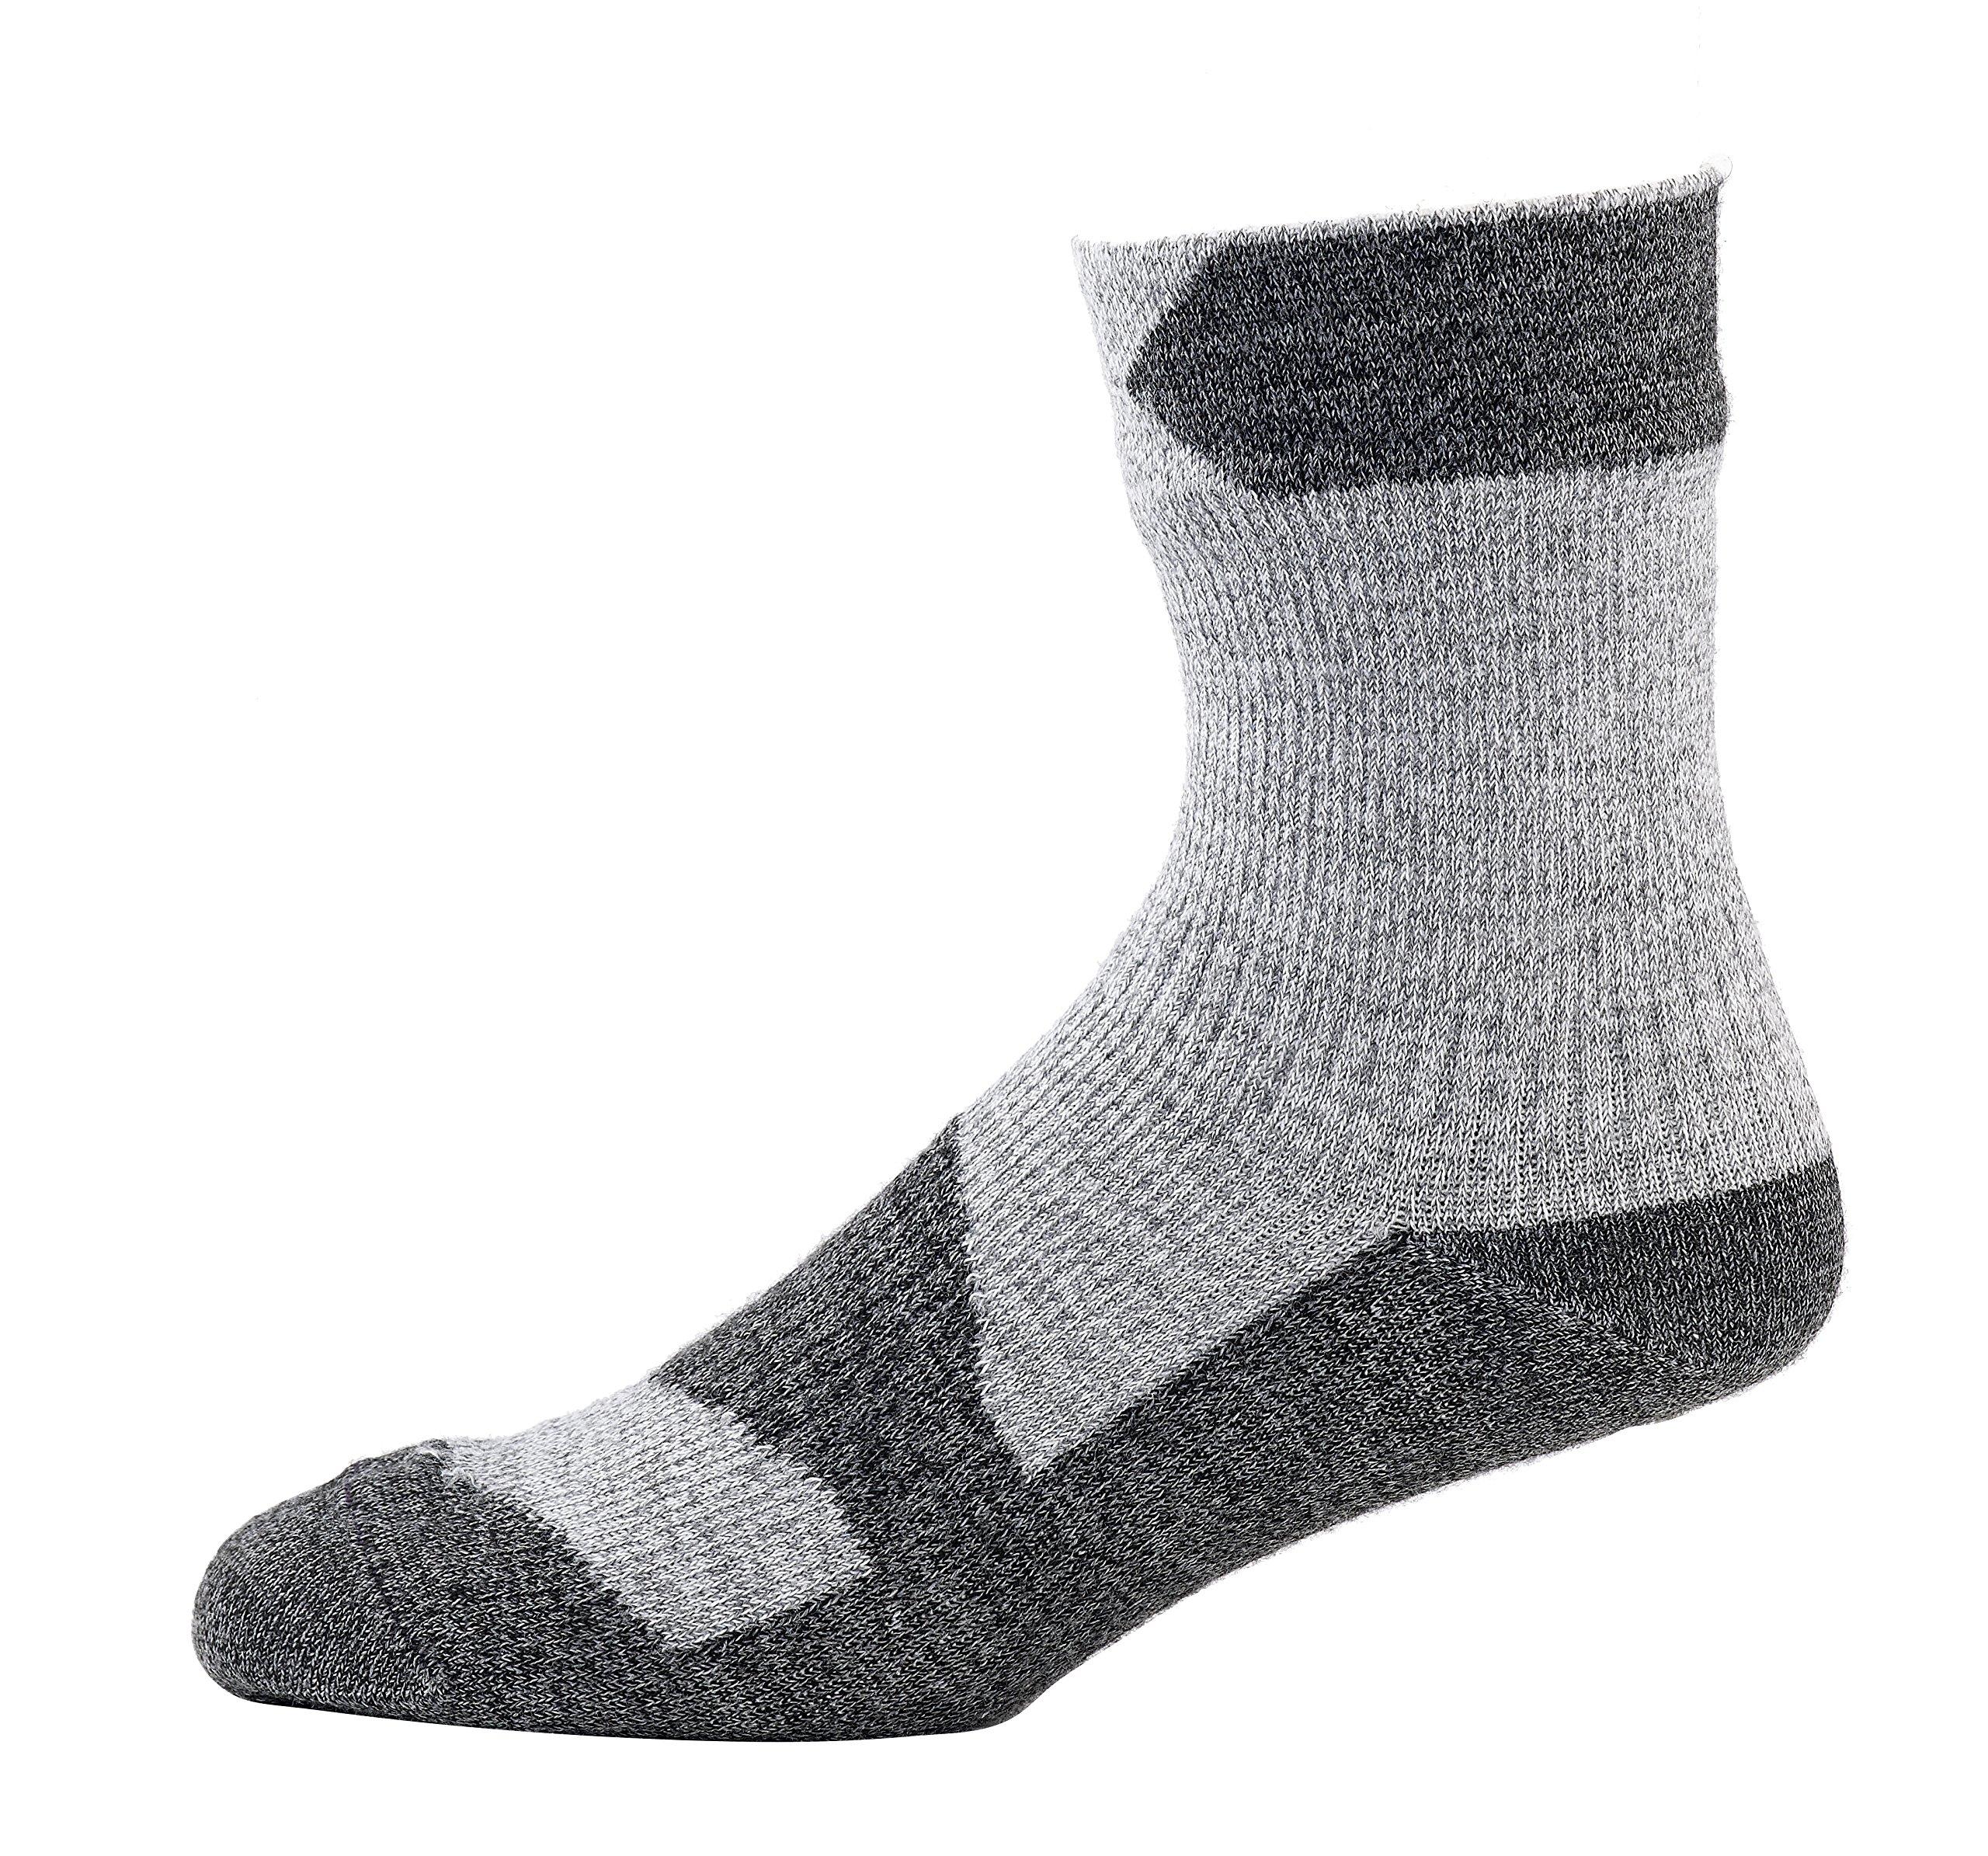 SealSkinz Walking Thin Ankle Socks, Medium - Grey Marl/Dark Grey. With a Helicase brand sock ring